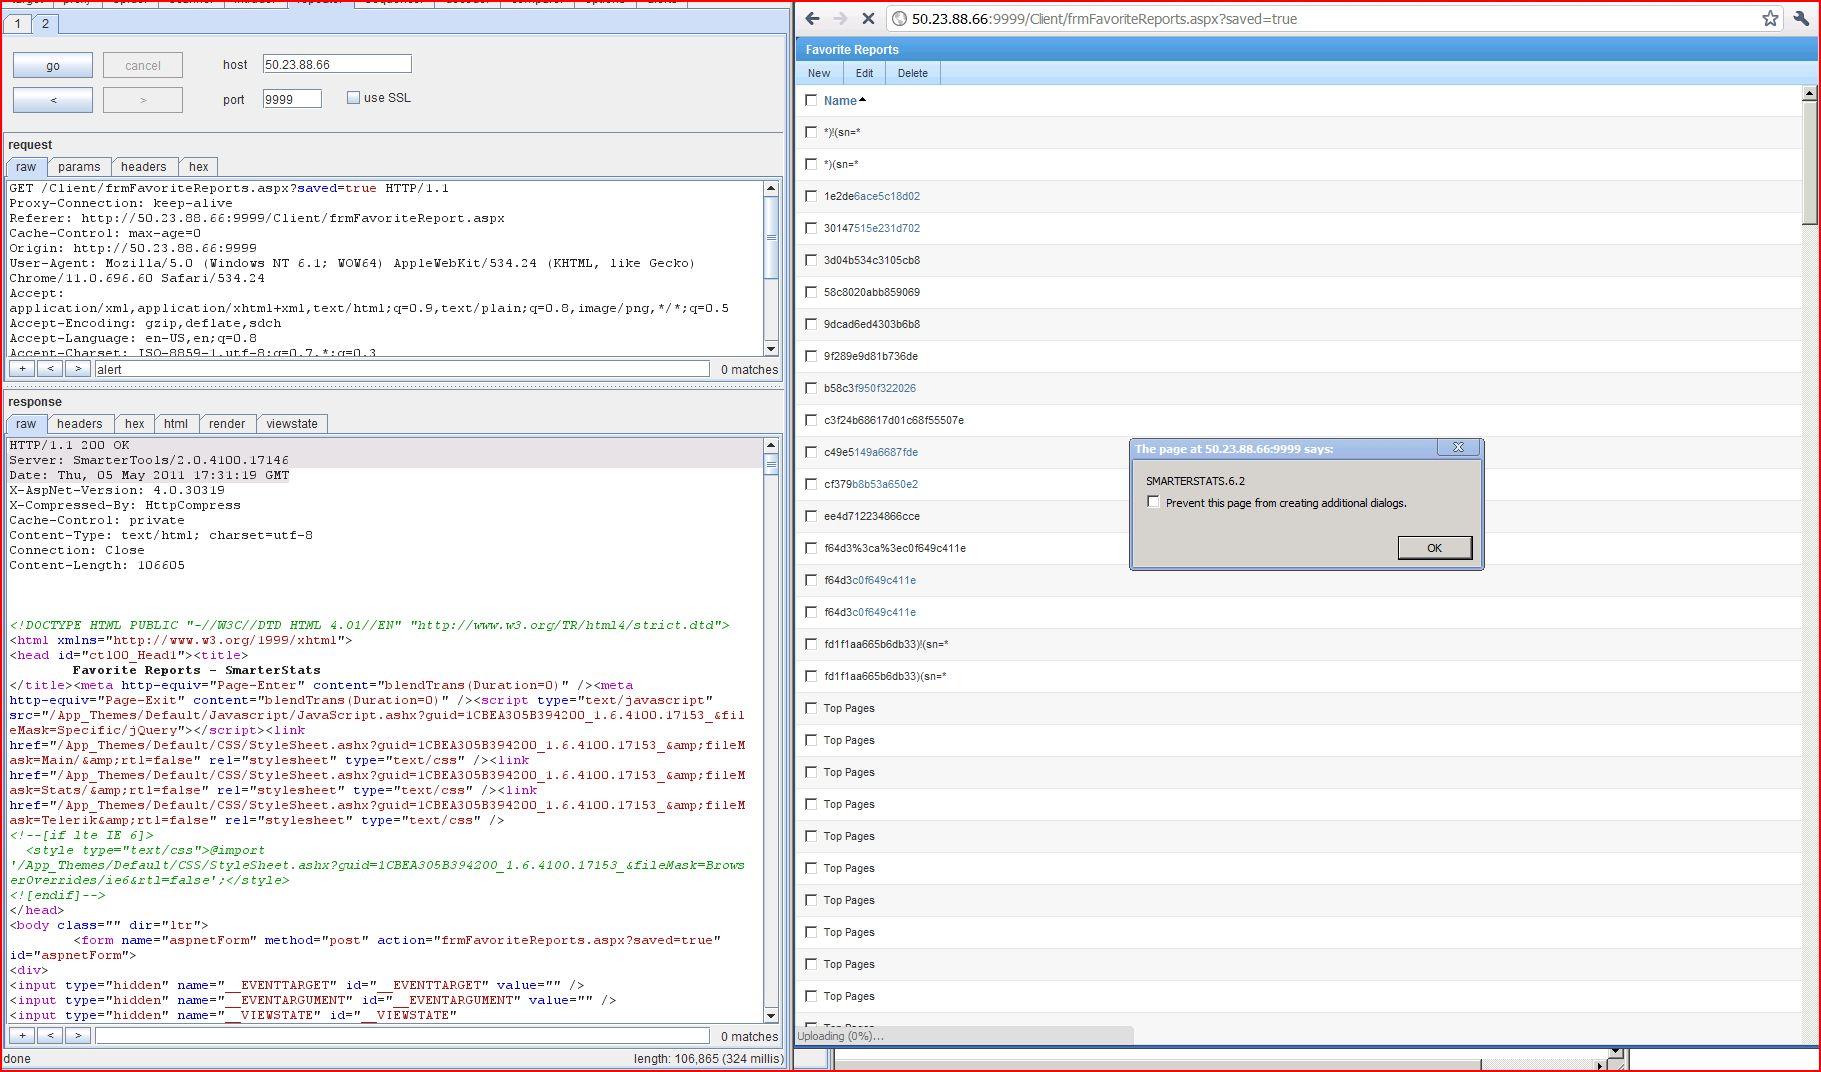 XSS in SmarterStats 5.2.4100, XSS, DORK, GHDB, Cross Site Scripting, CWE-79, CAPEC-86